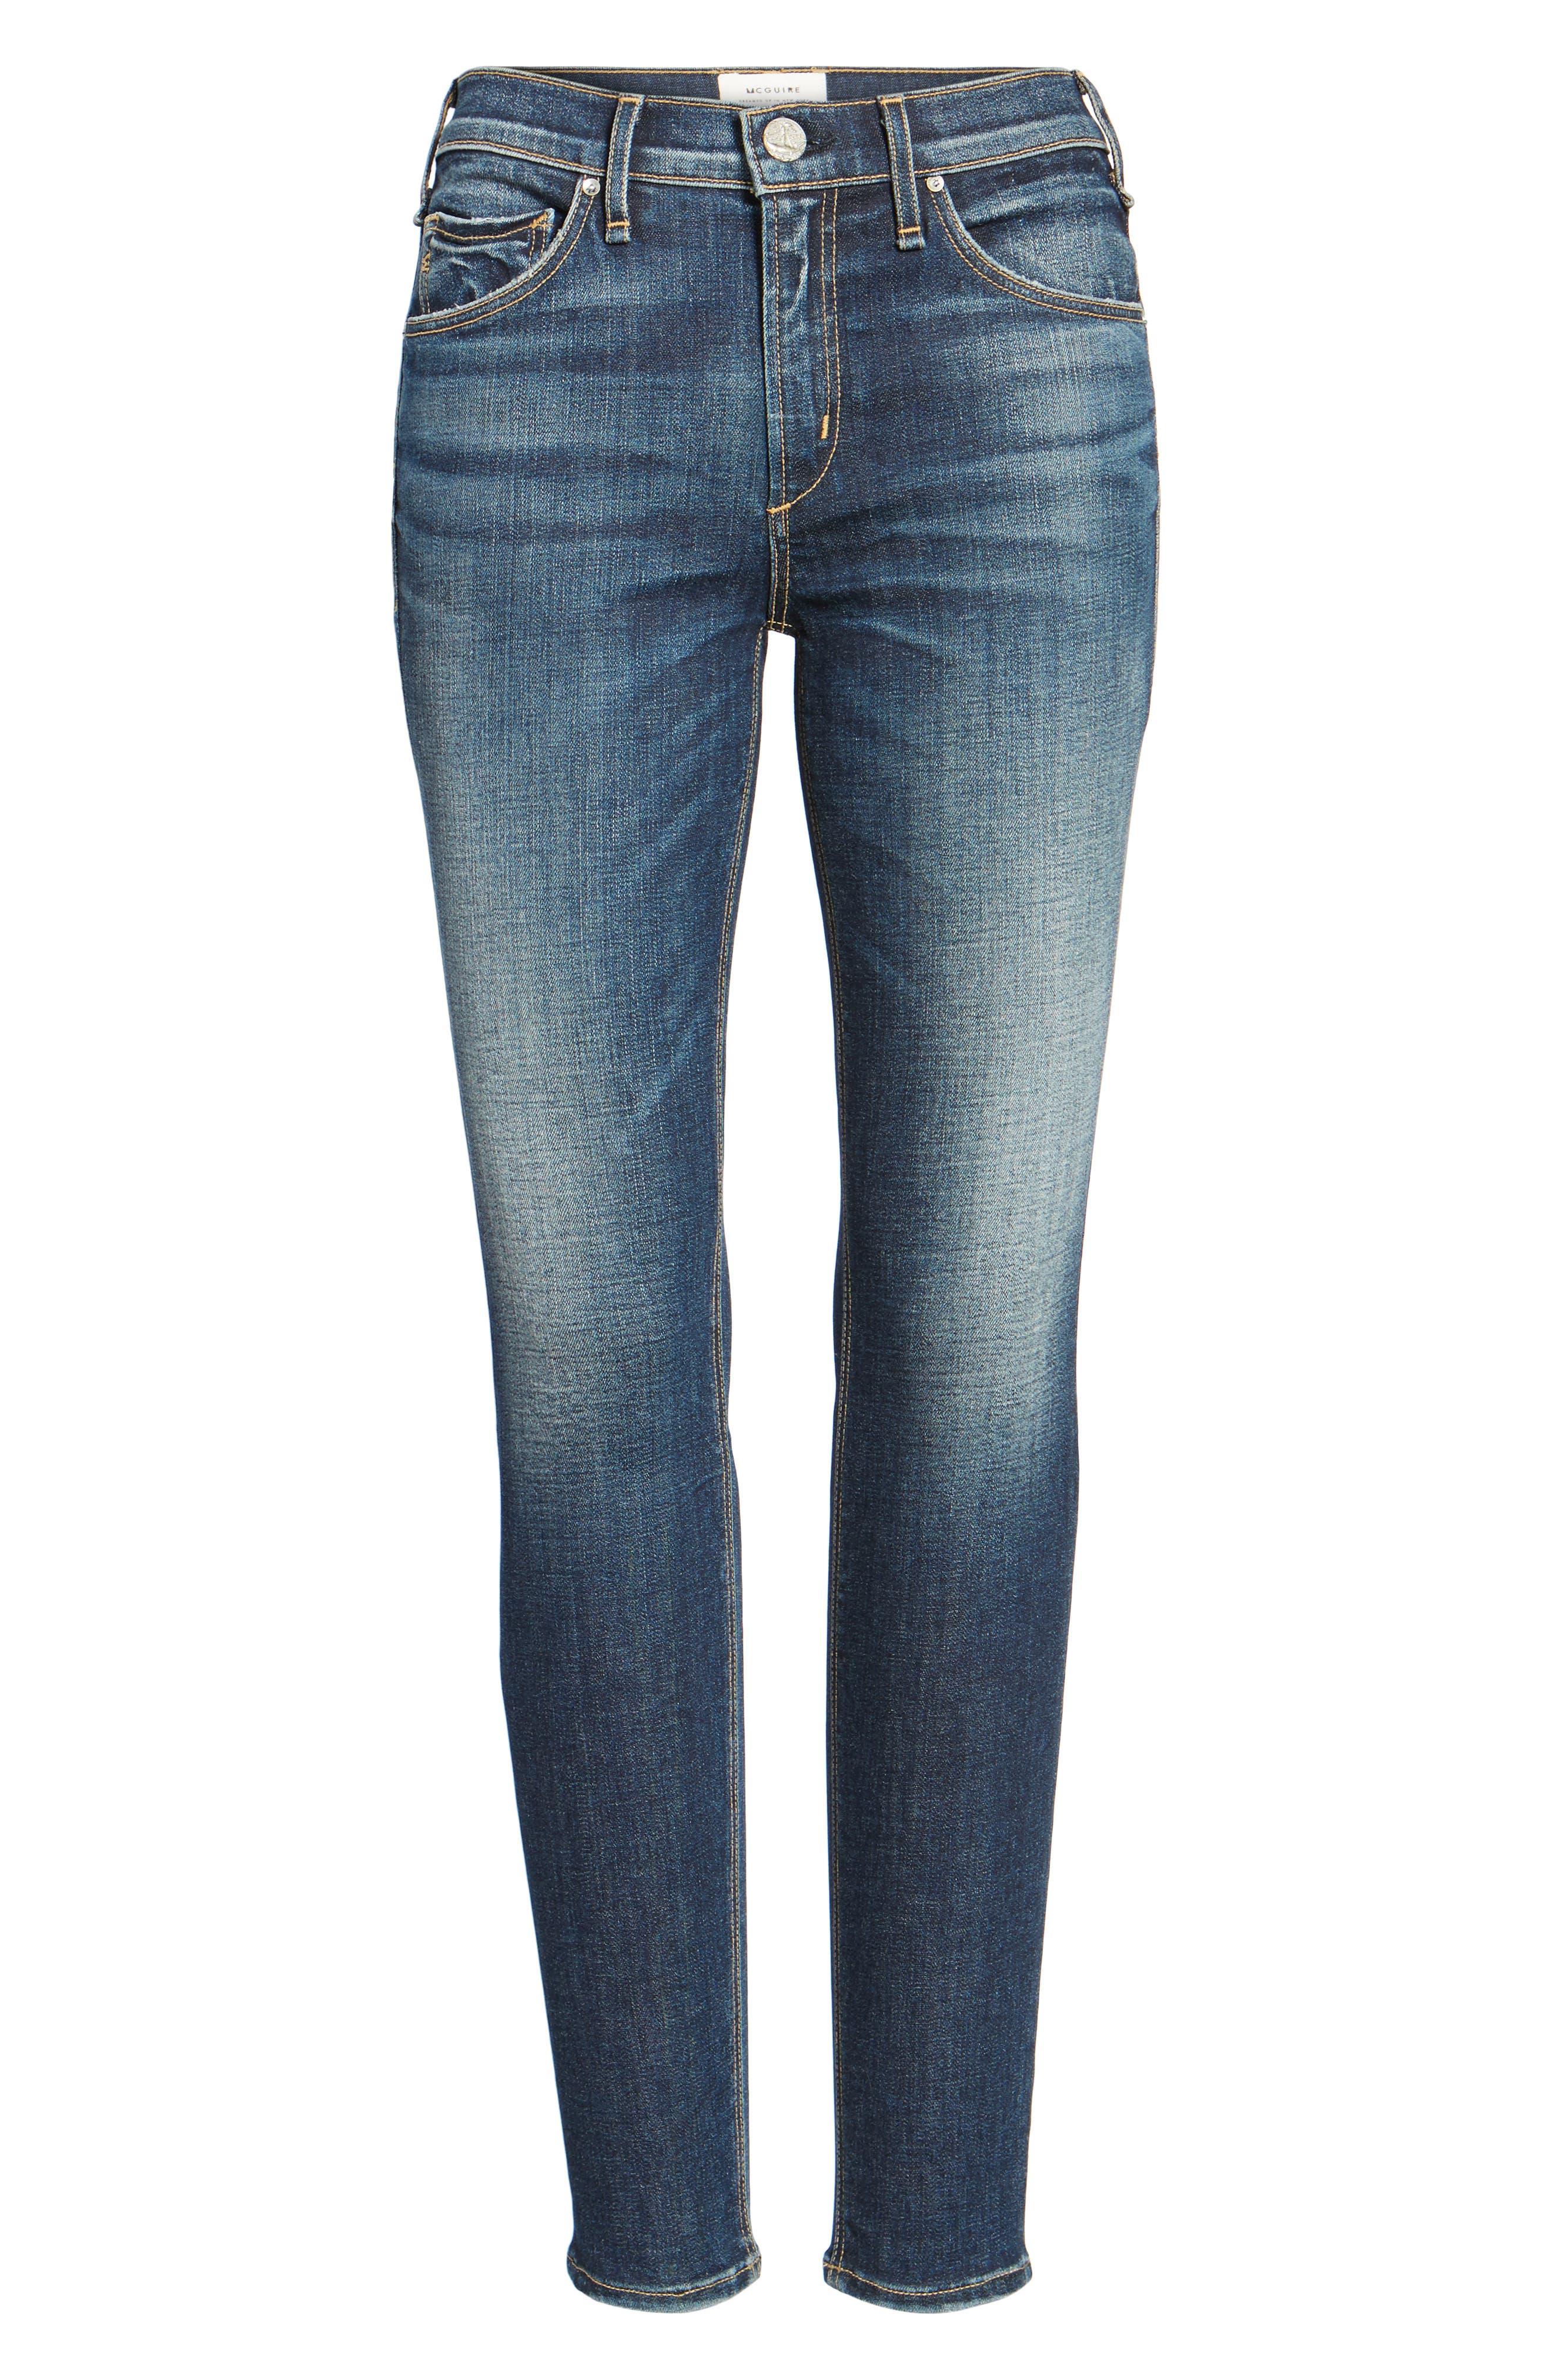 Newton High Waist Skinny Jeans,                             Alternate thumbnail 6, color,                             420